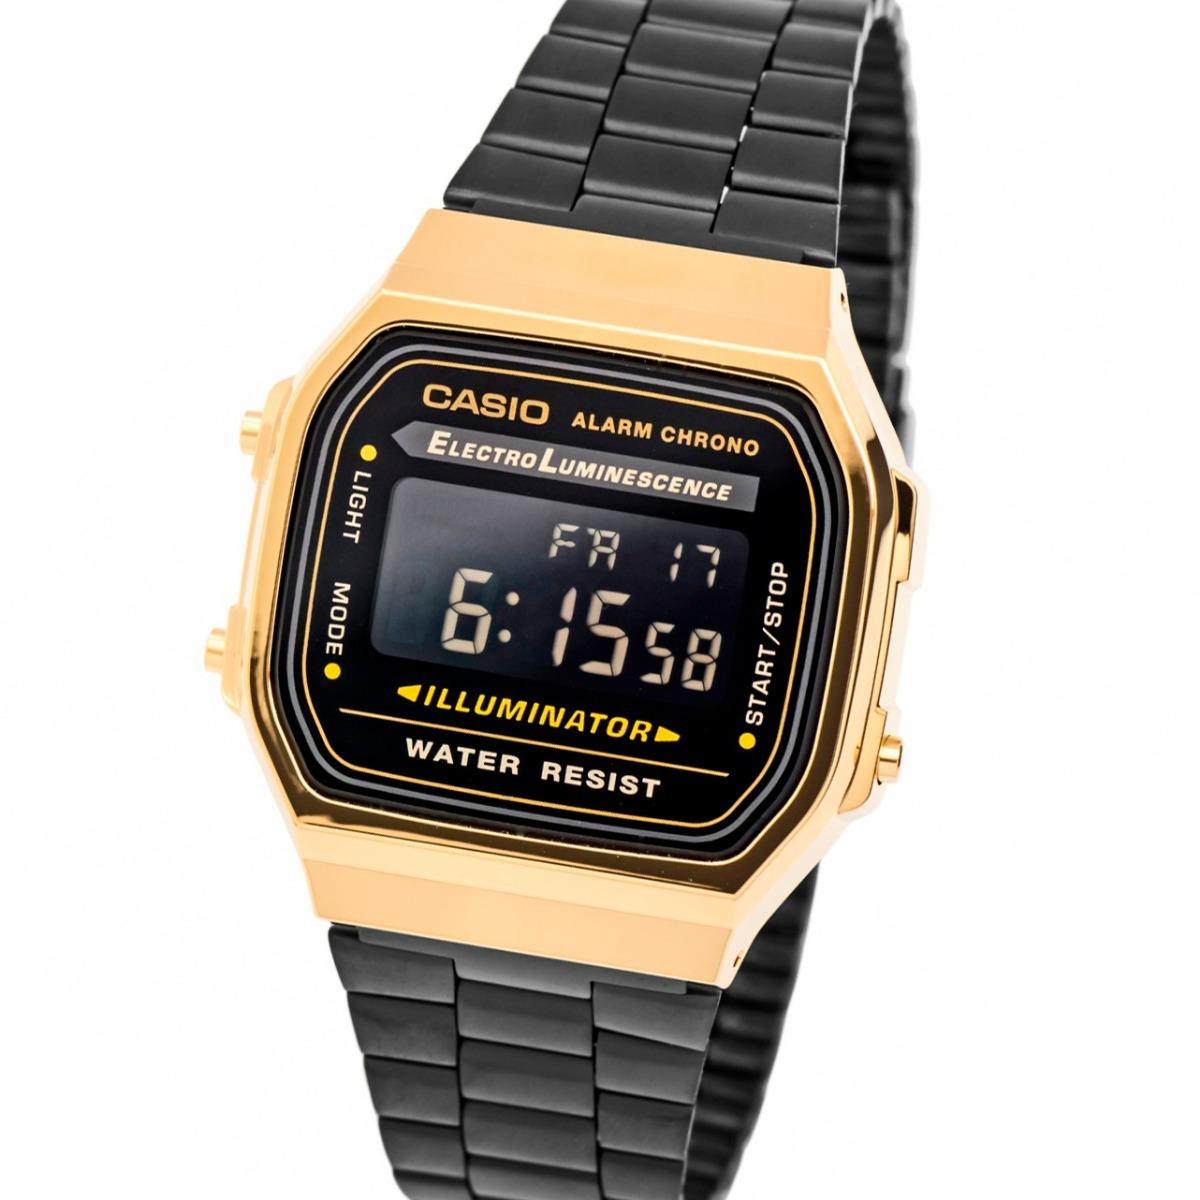 Retro Casio Cronografo 168wegb 1b Reloj A Vintage Xn0OPk8w